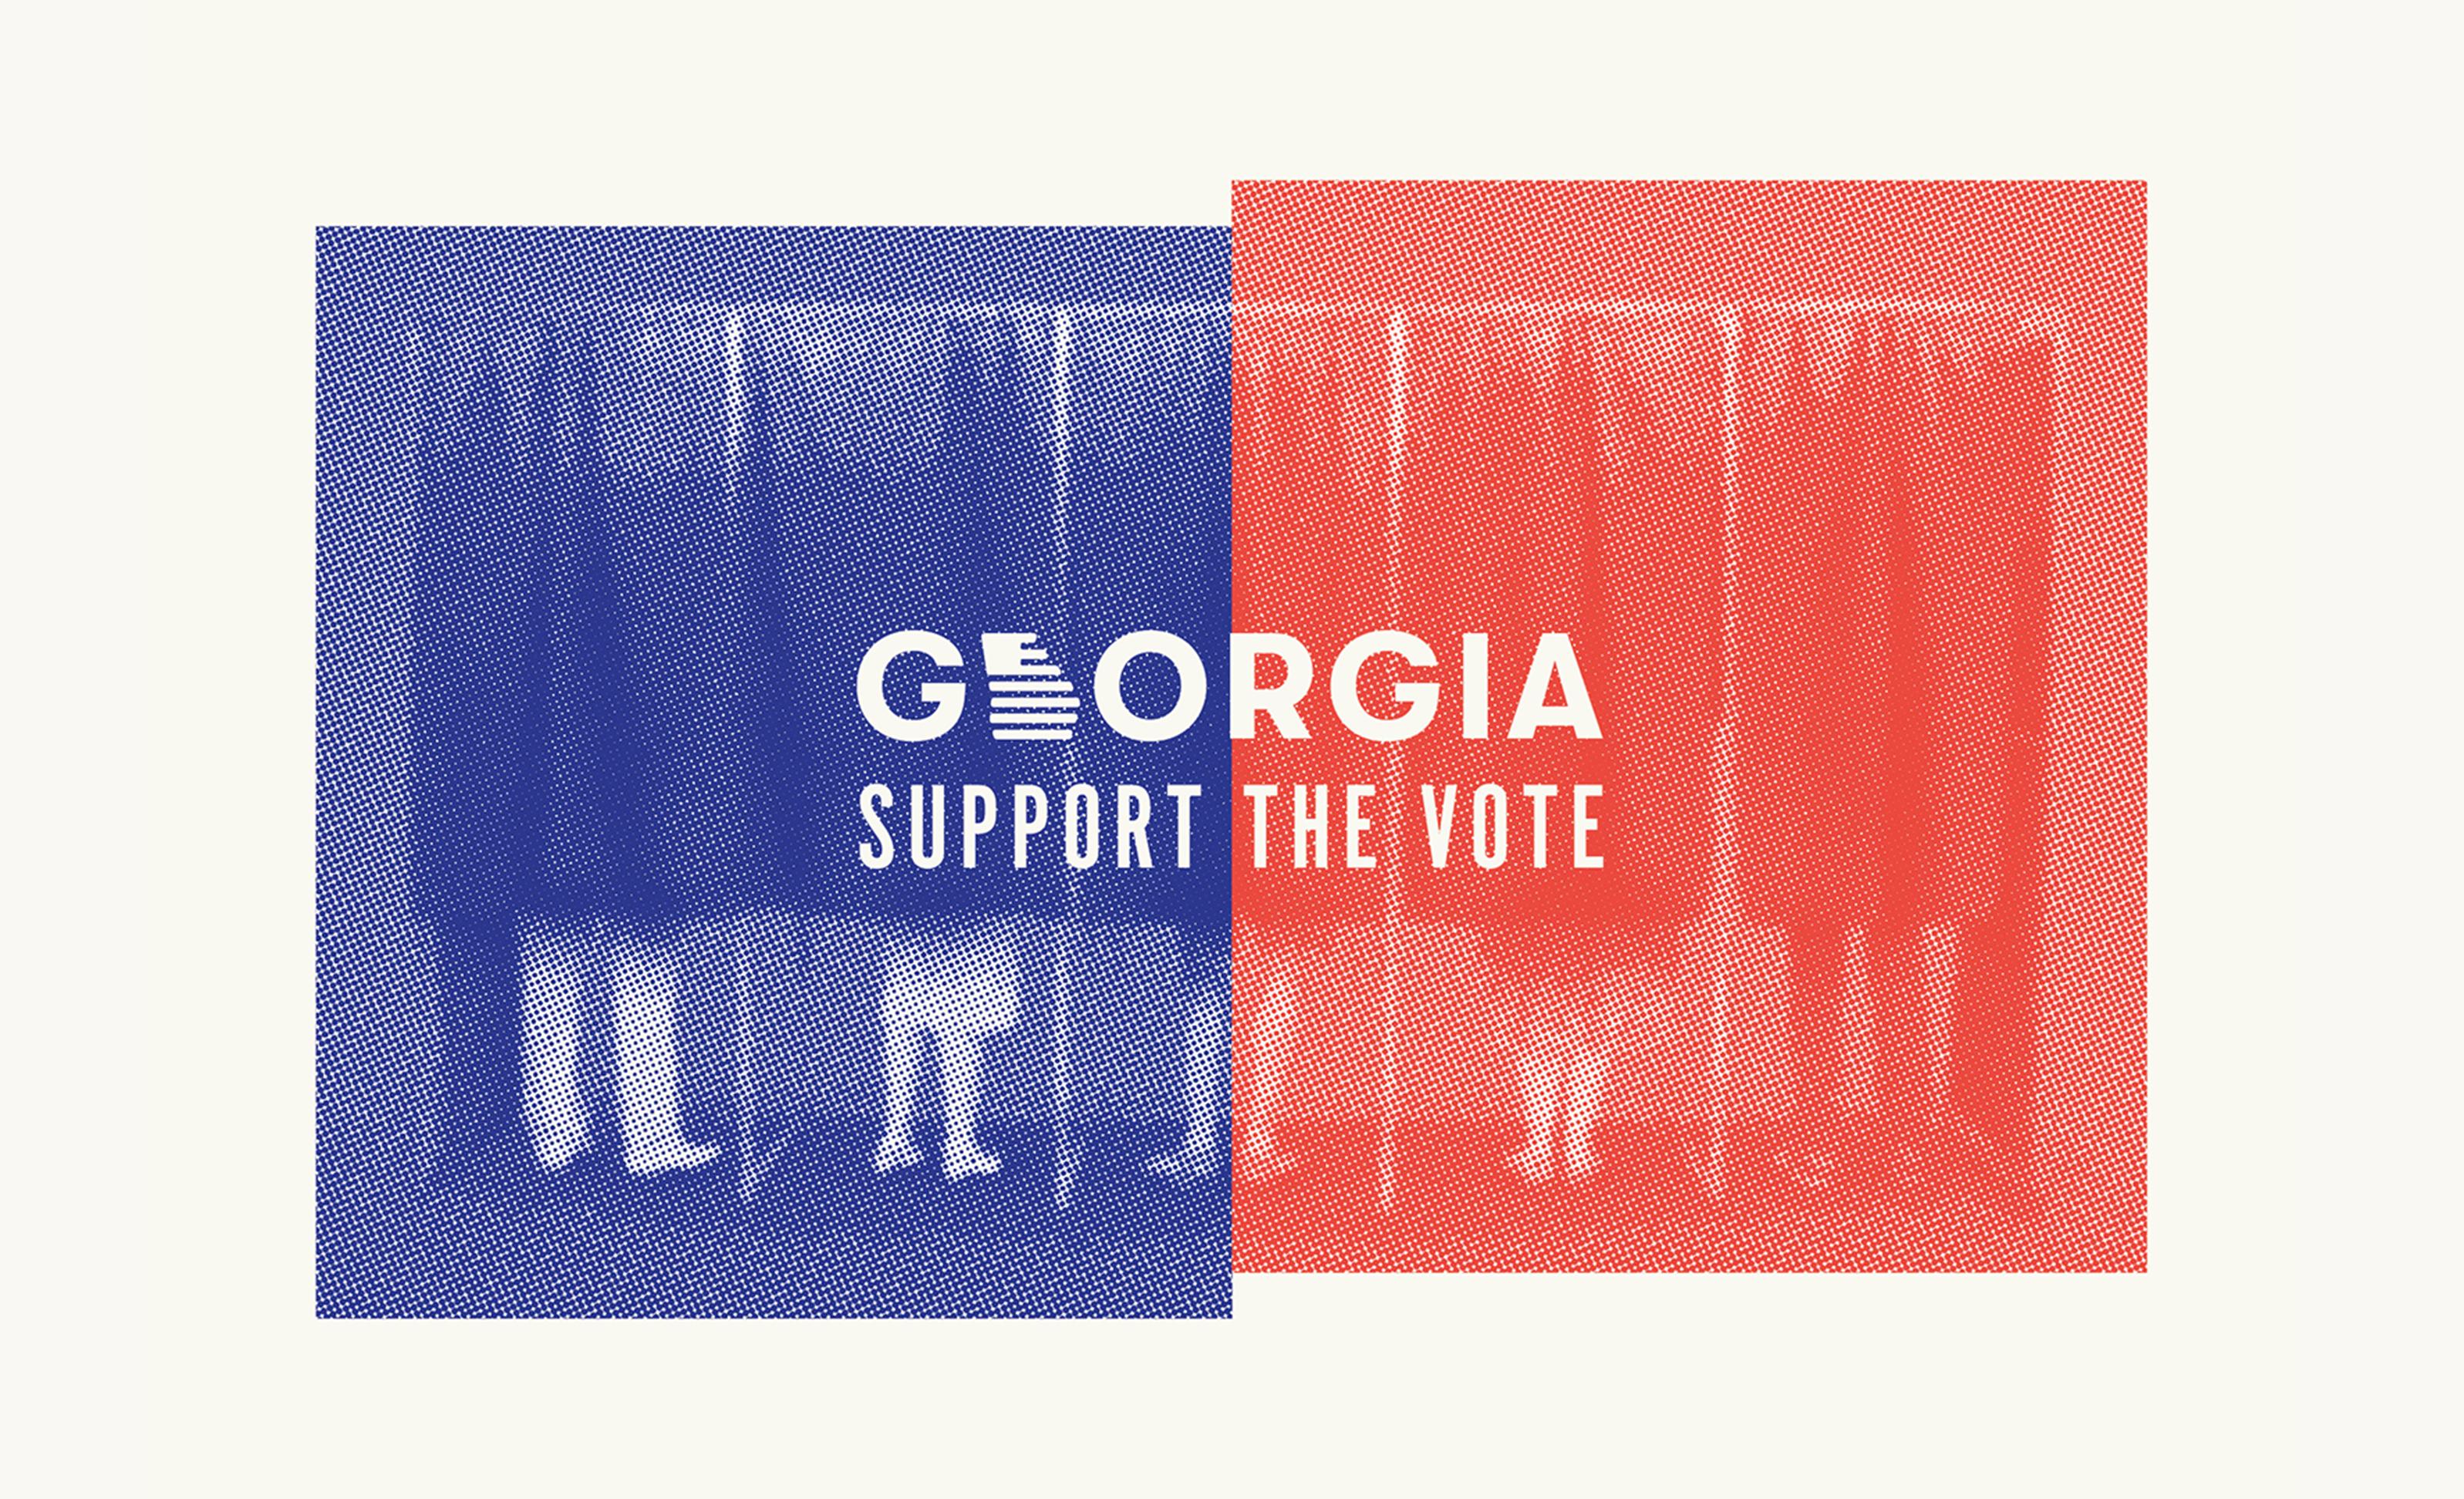 Georgia Support the Vote Branding